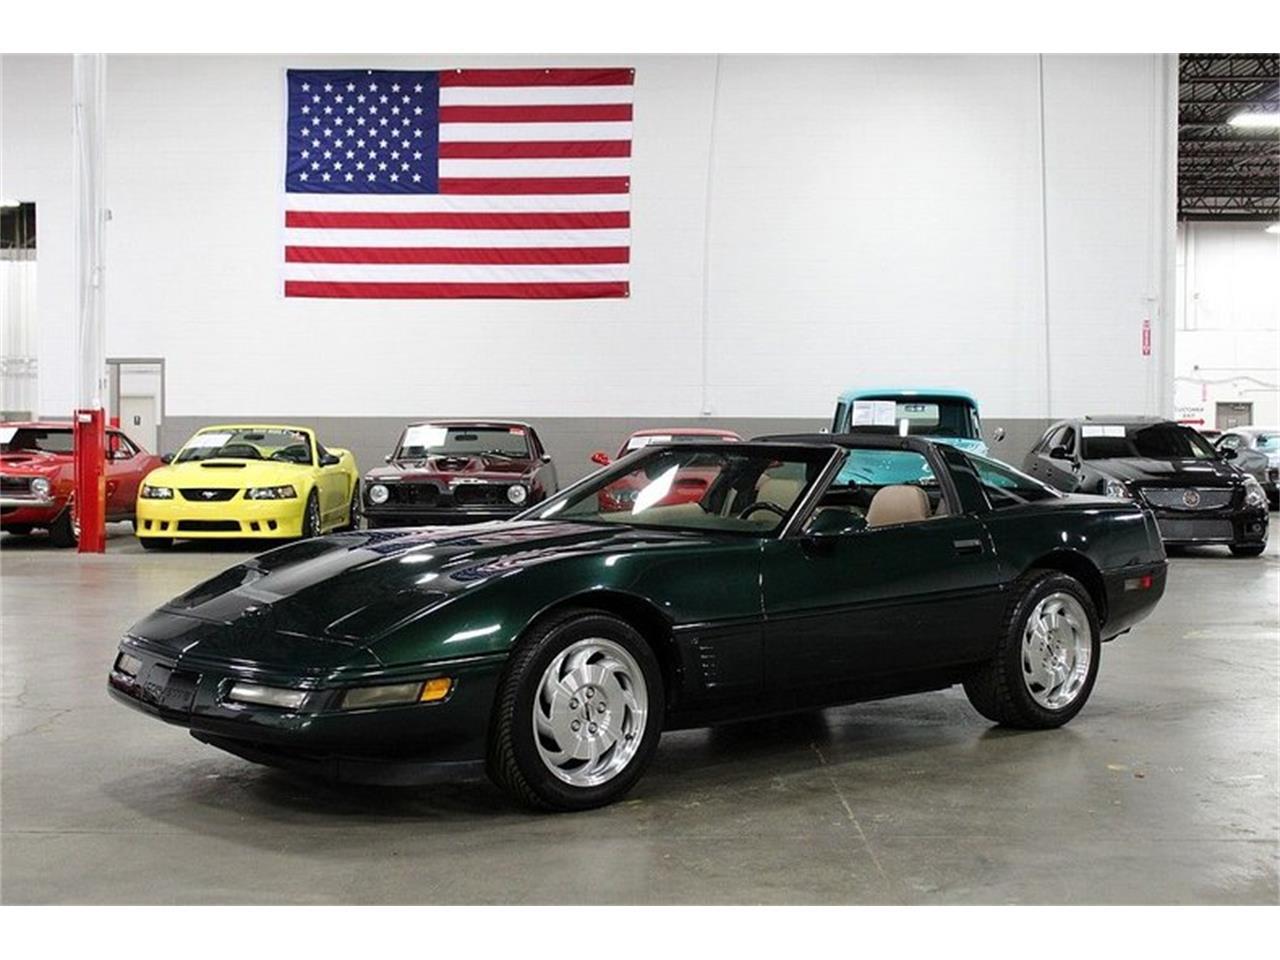 1995 Corvette For Sale >> For Sale 1995 Chevrolet Corvette In Kentwood Michigan